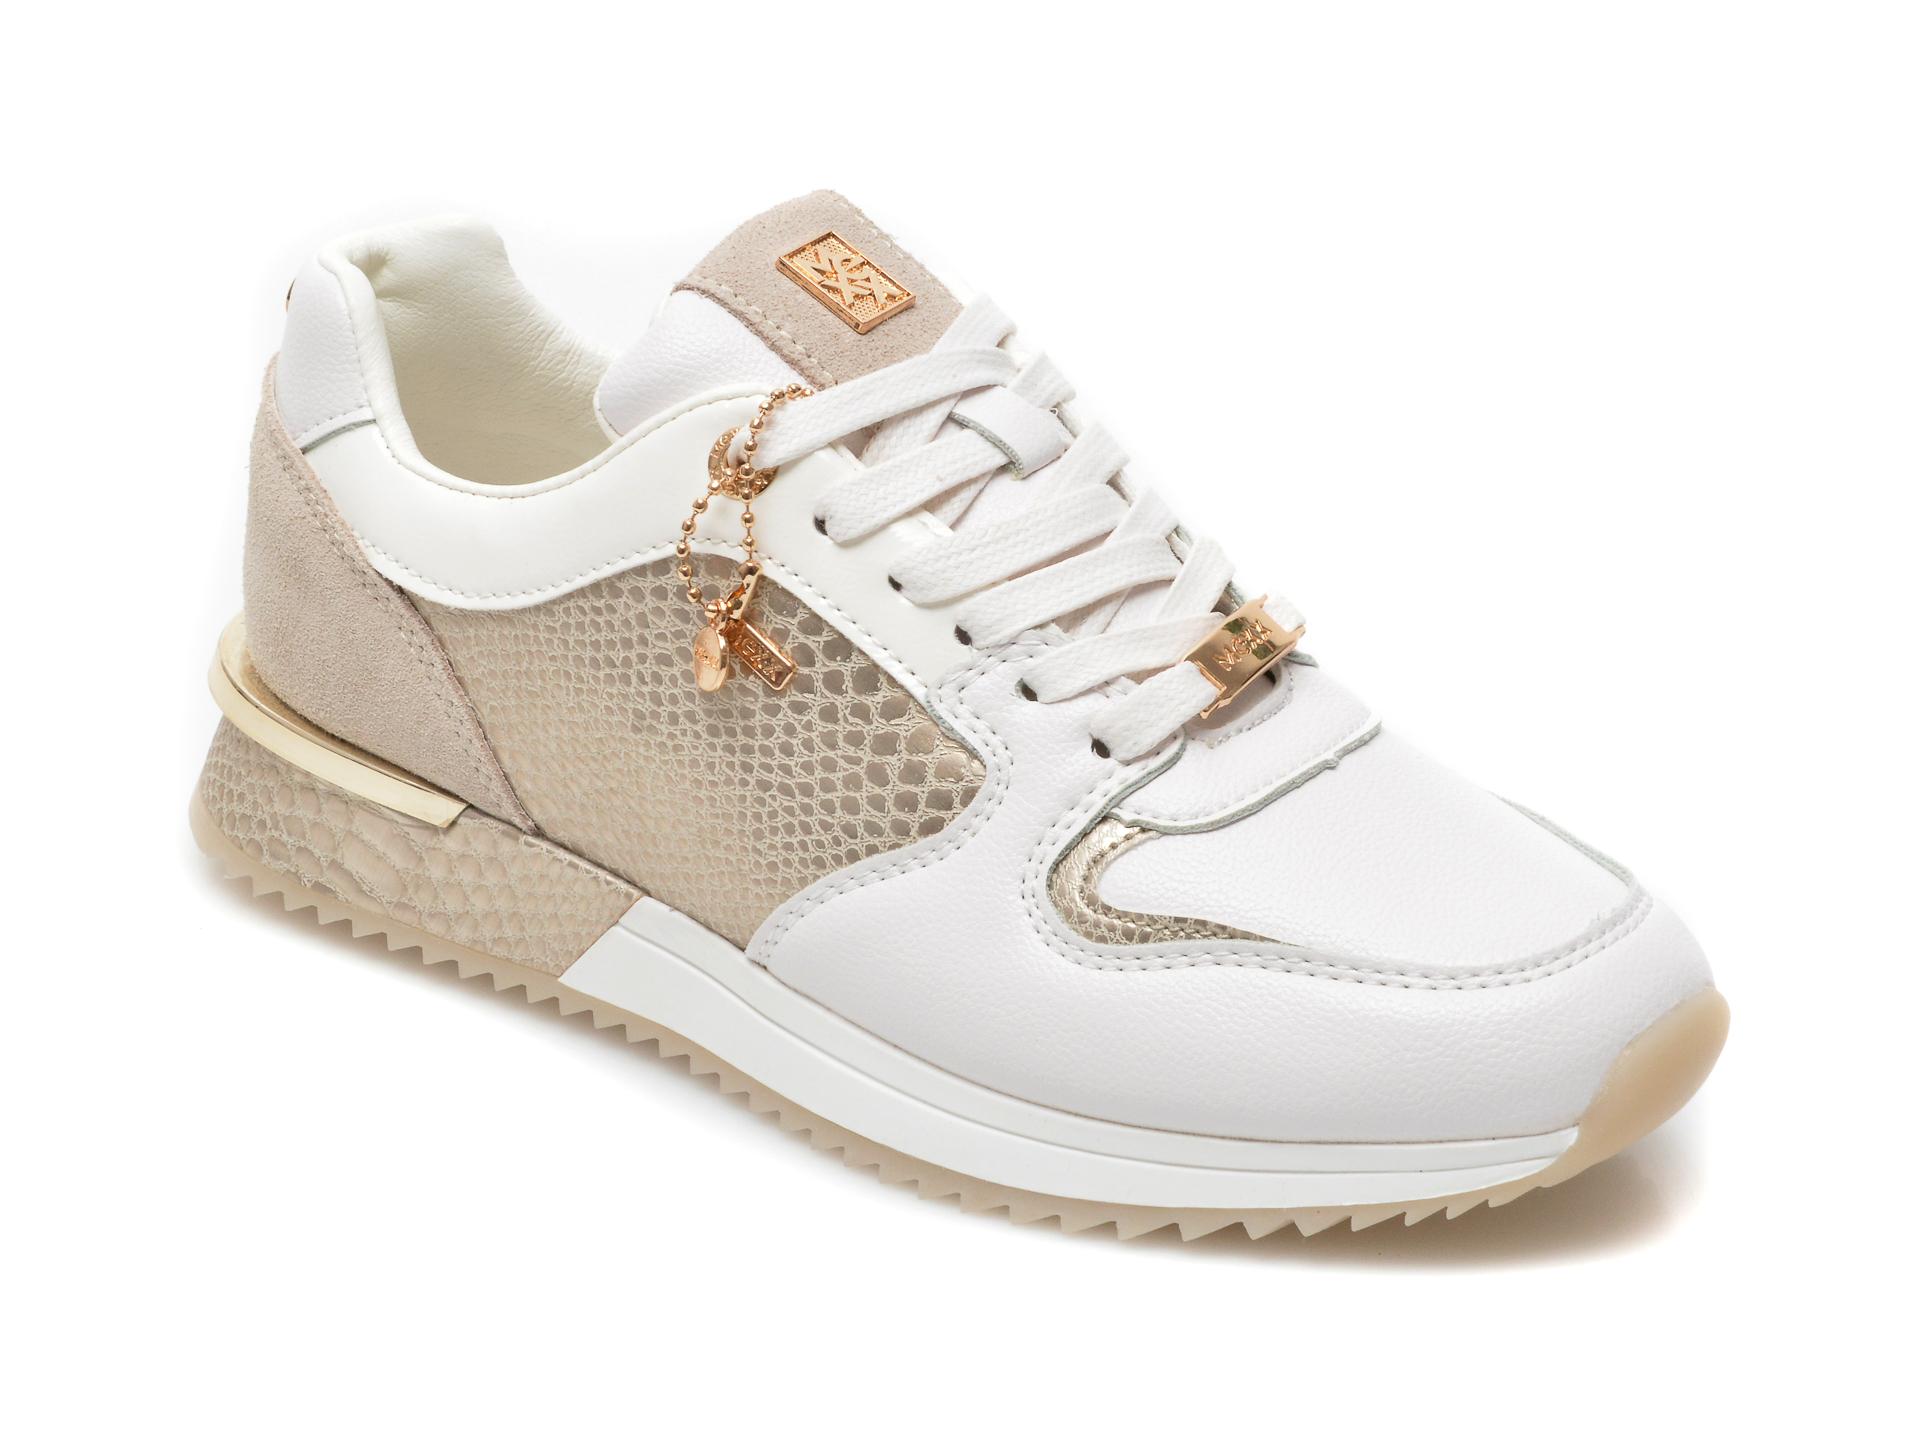 Pantofi sport MEXX albi, K0189, din piele ecologica imagine otter.ro